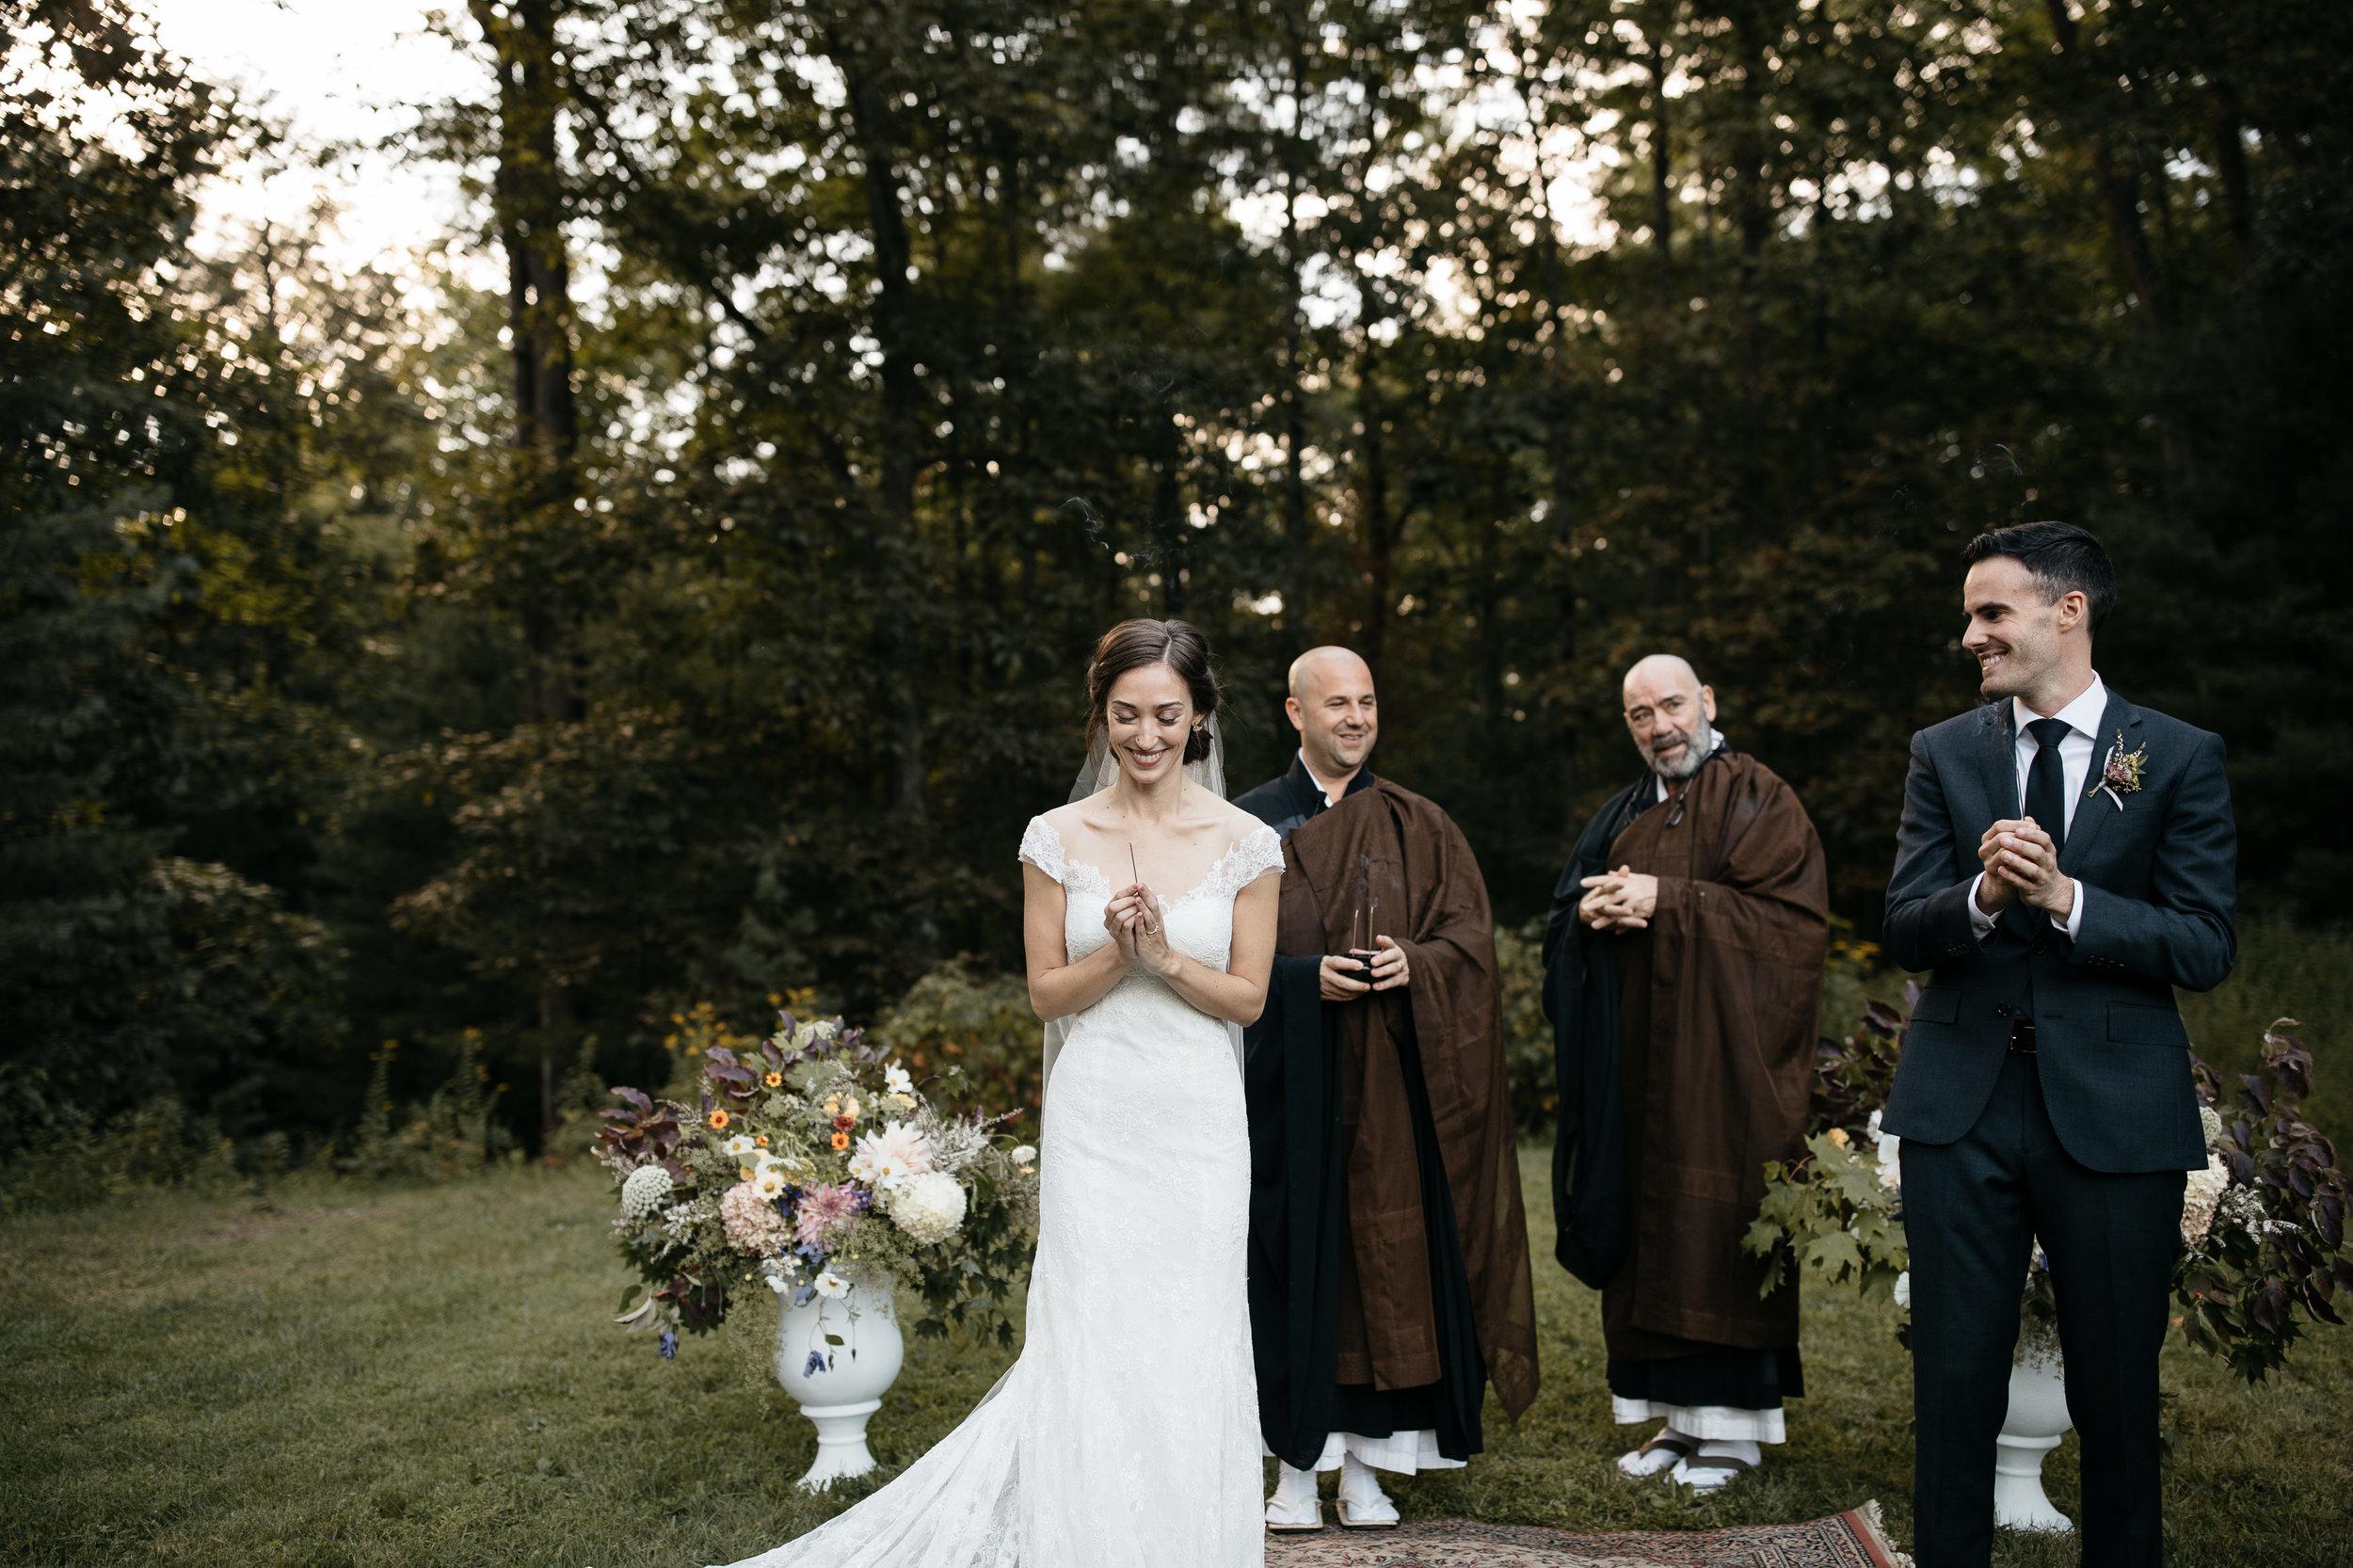 Wedding_Mount_Tremper_Arts_Catskills_Isabel_Robbie_JeanLaurentGaudy_399.jpg